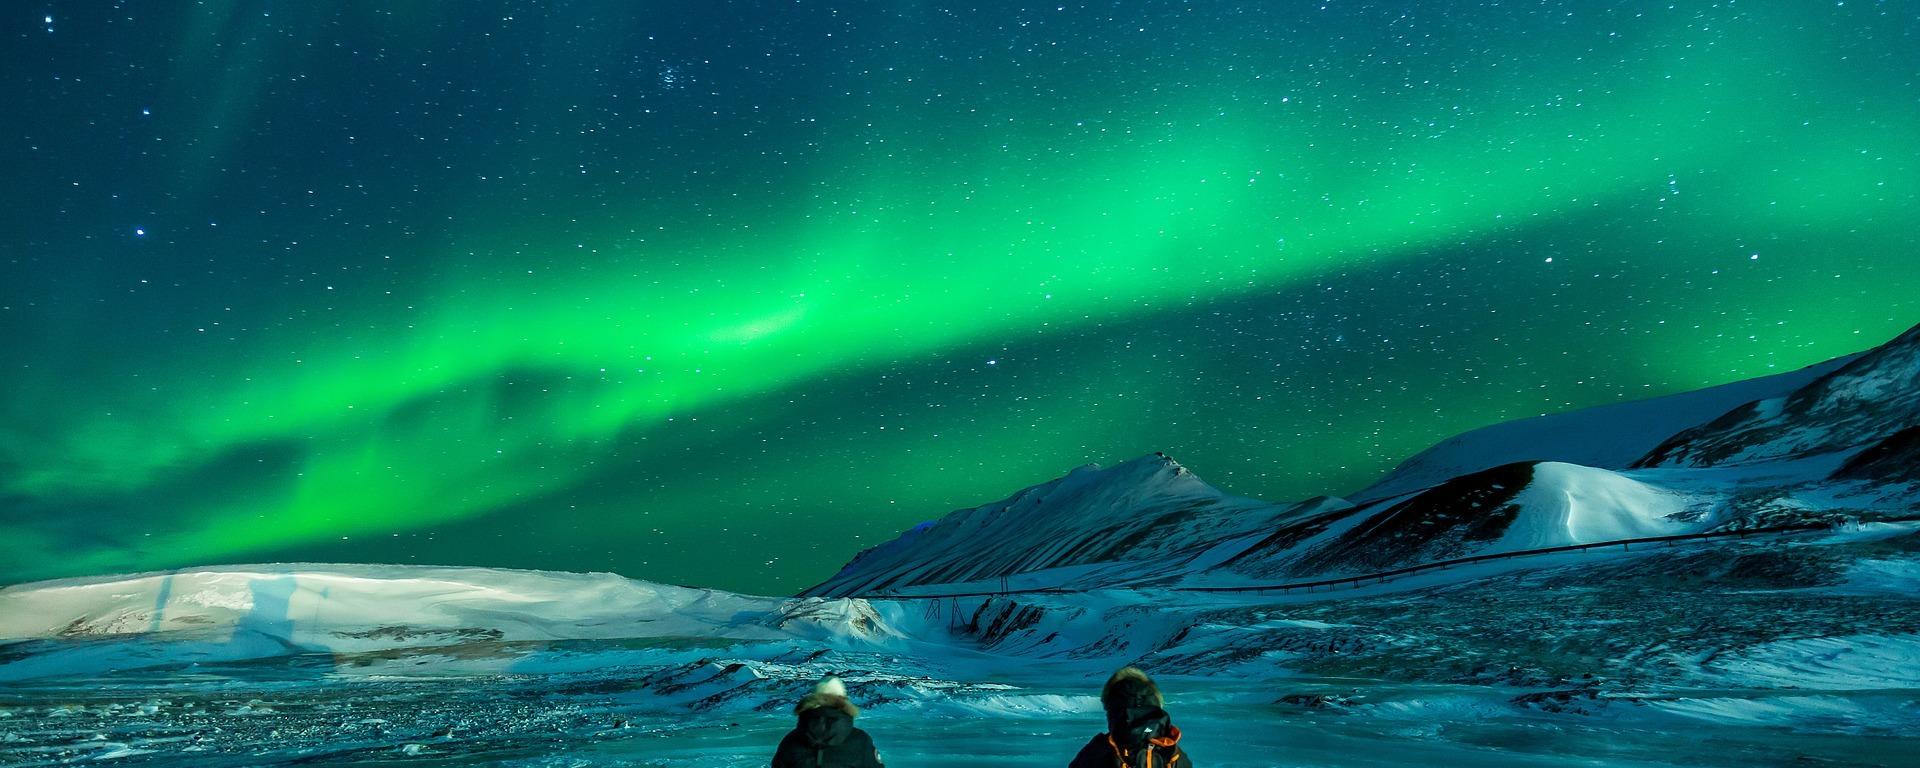 aurora,polar lights,northen lights,aurora borealis,ice,stars,arctic,snowy,landscape,cold,night,nature,alaska,adventure,extreme